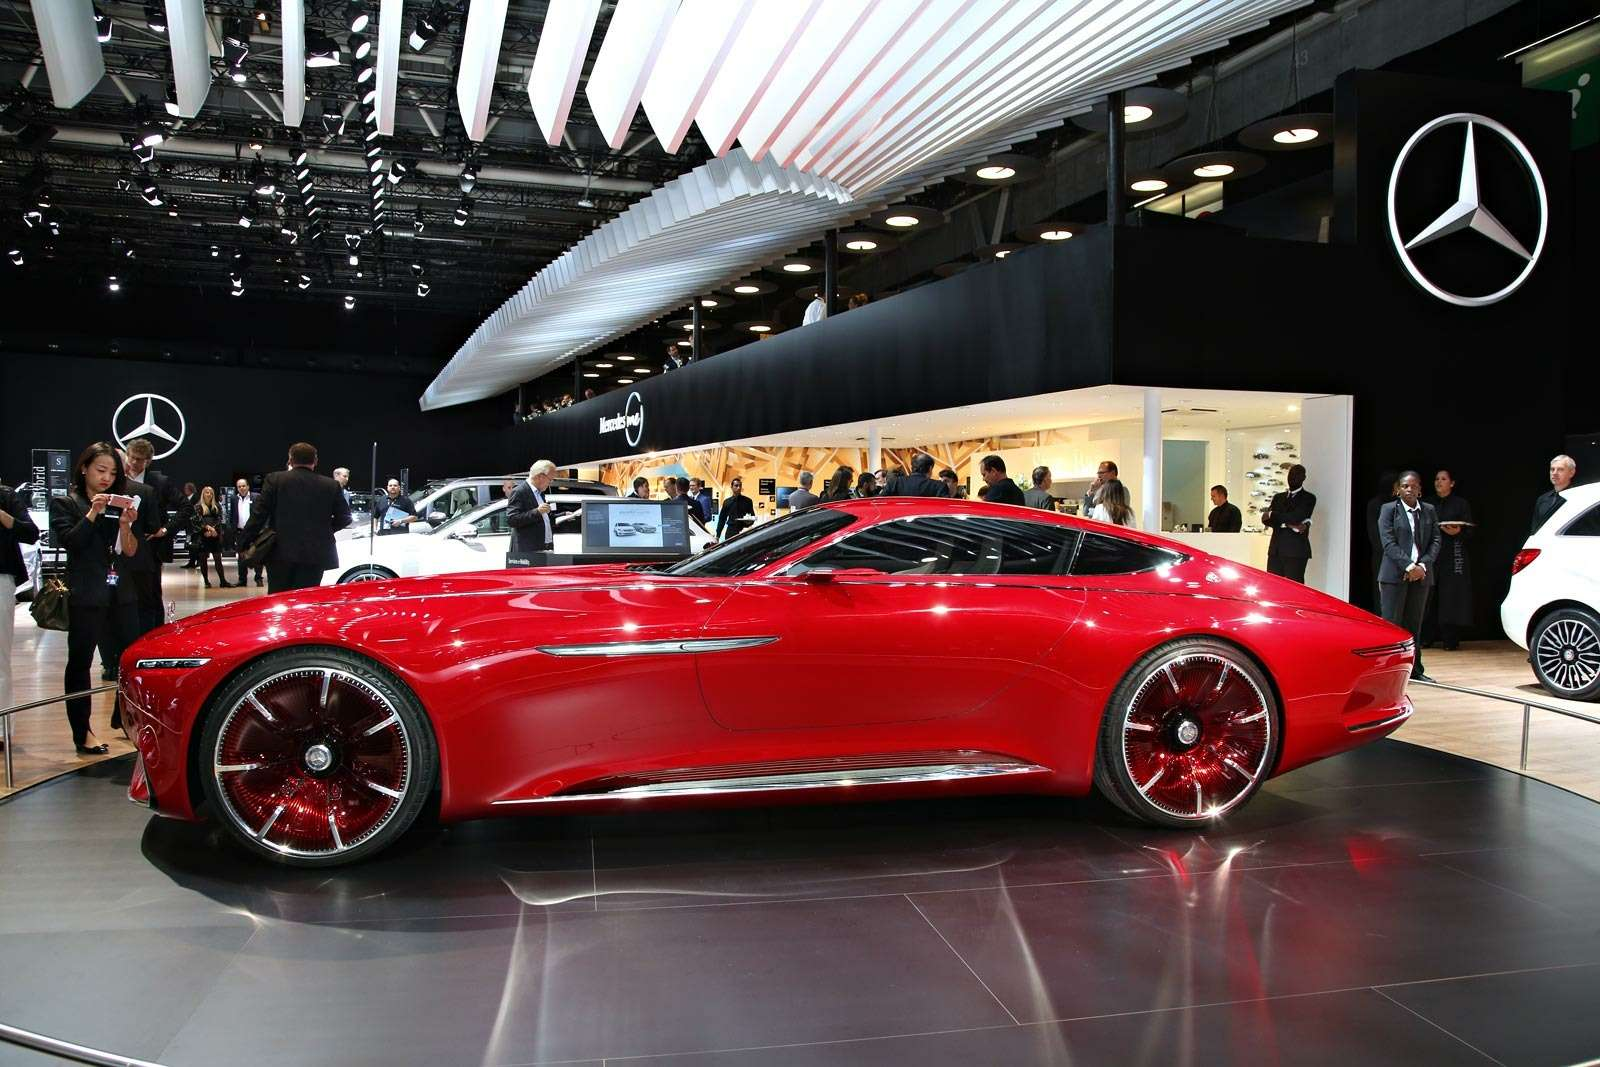 Самый красивый автомобиль Парижа: Vision Mercedes-Maybach 6завоевывает сердца— фото 643577